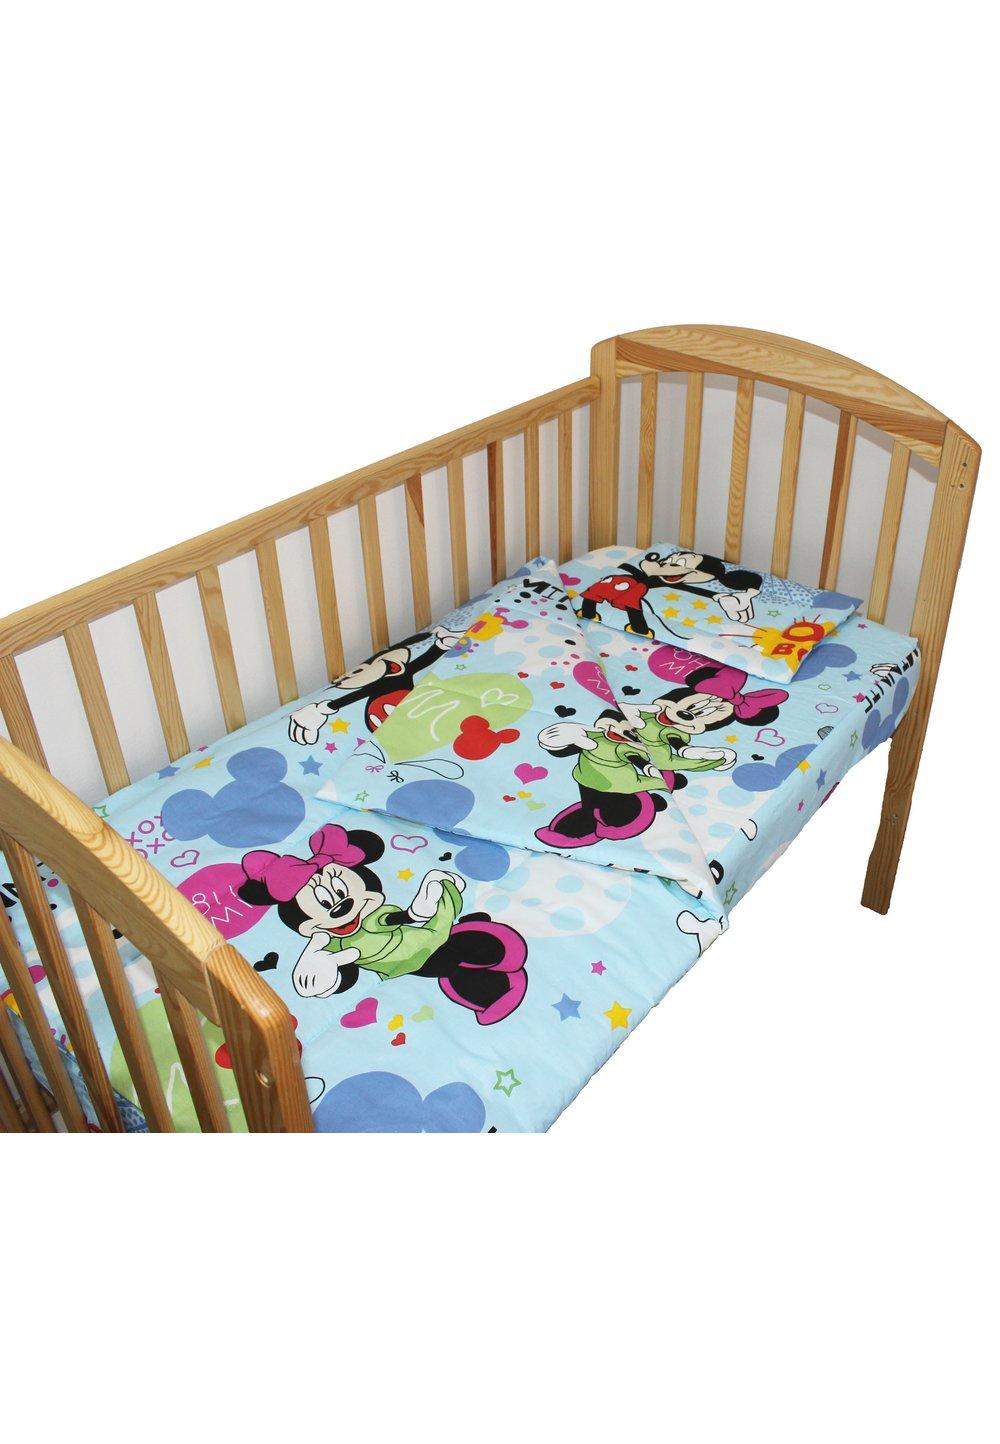 Lenjerie patut, 3 piese, Minnie si Mickey, albastru, 120 x 60 cm imagine